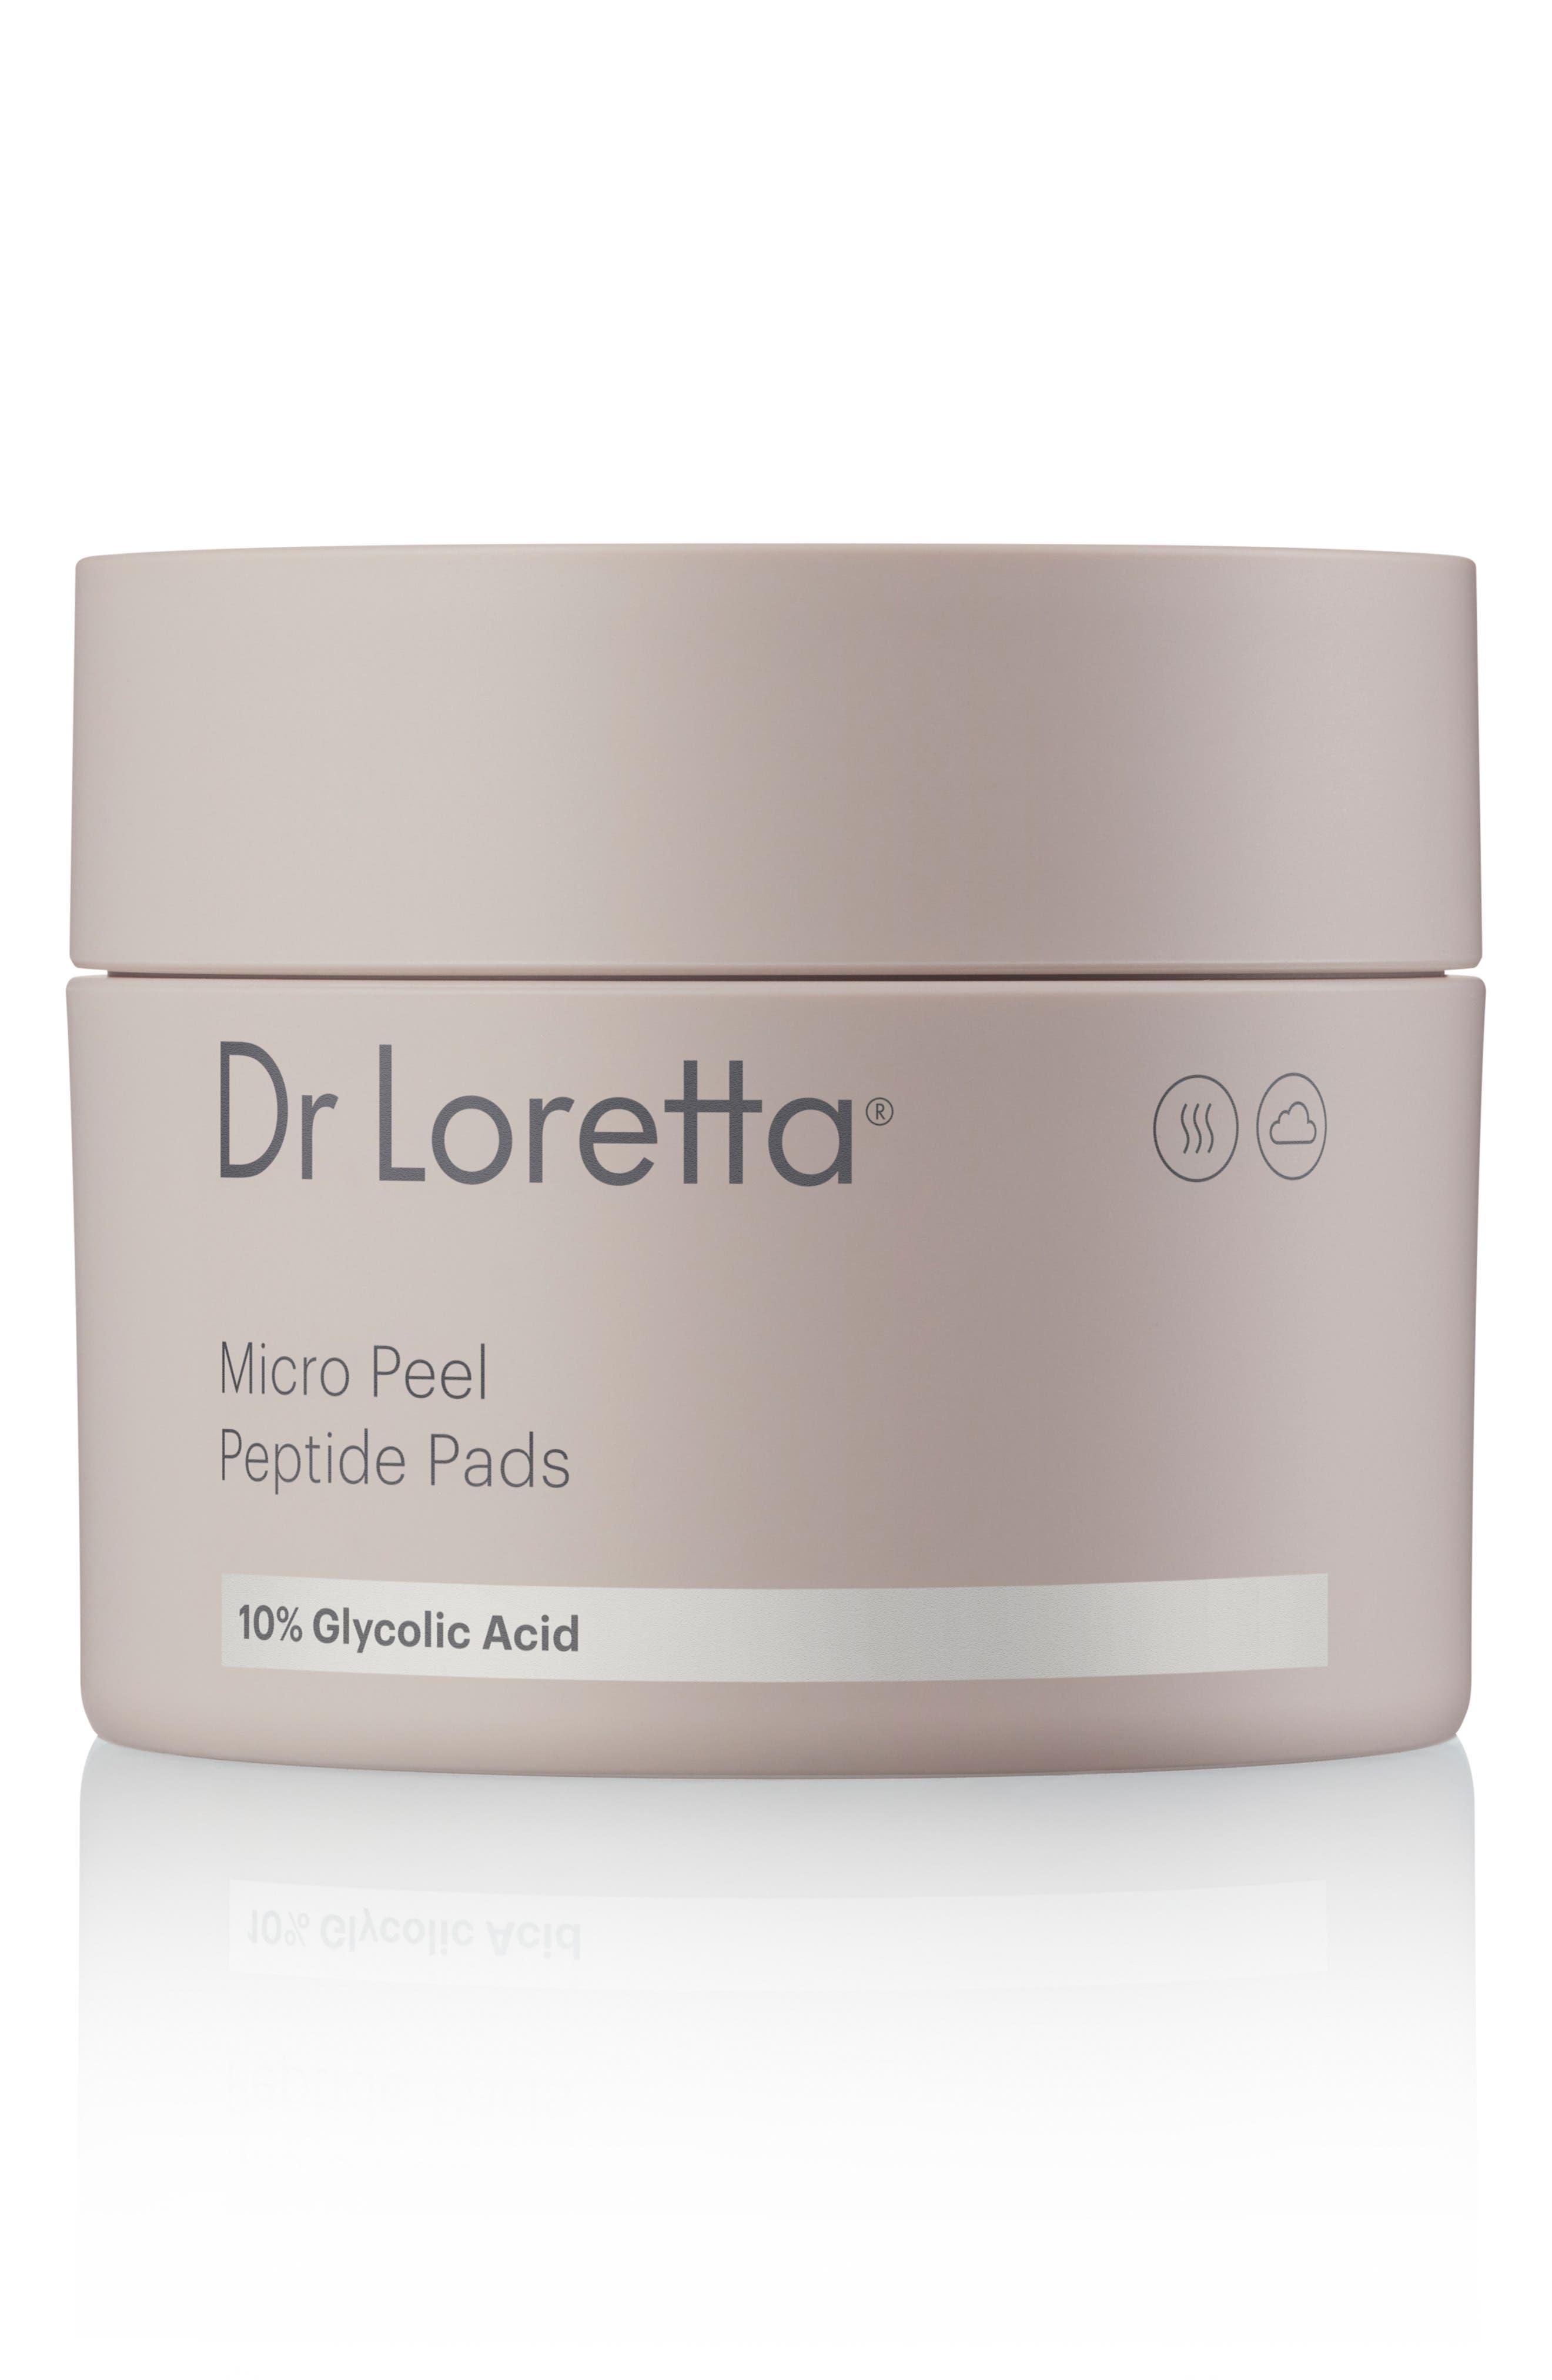 Dr. Loretta Micro Peel Peptide Pads at Nordstrom